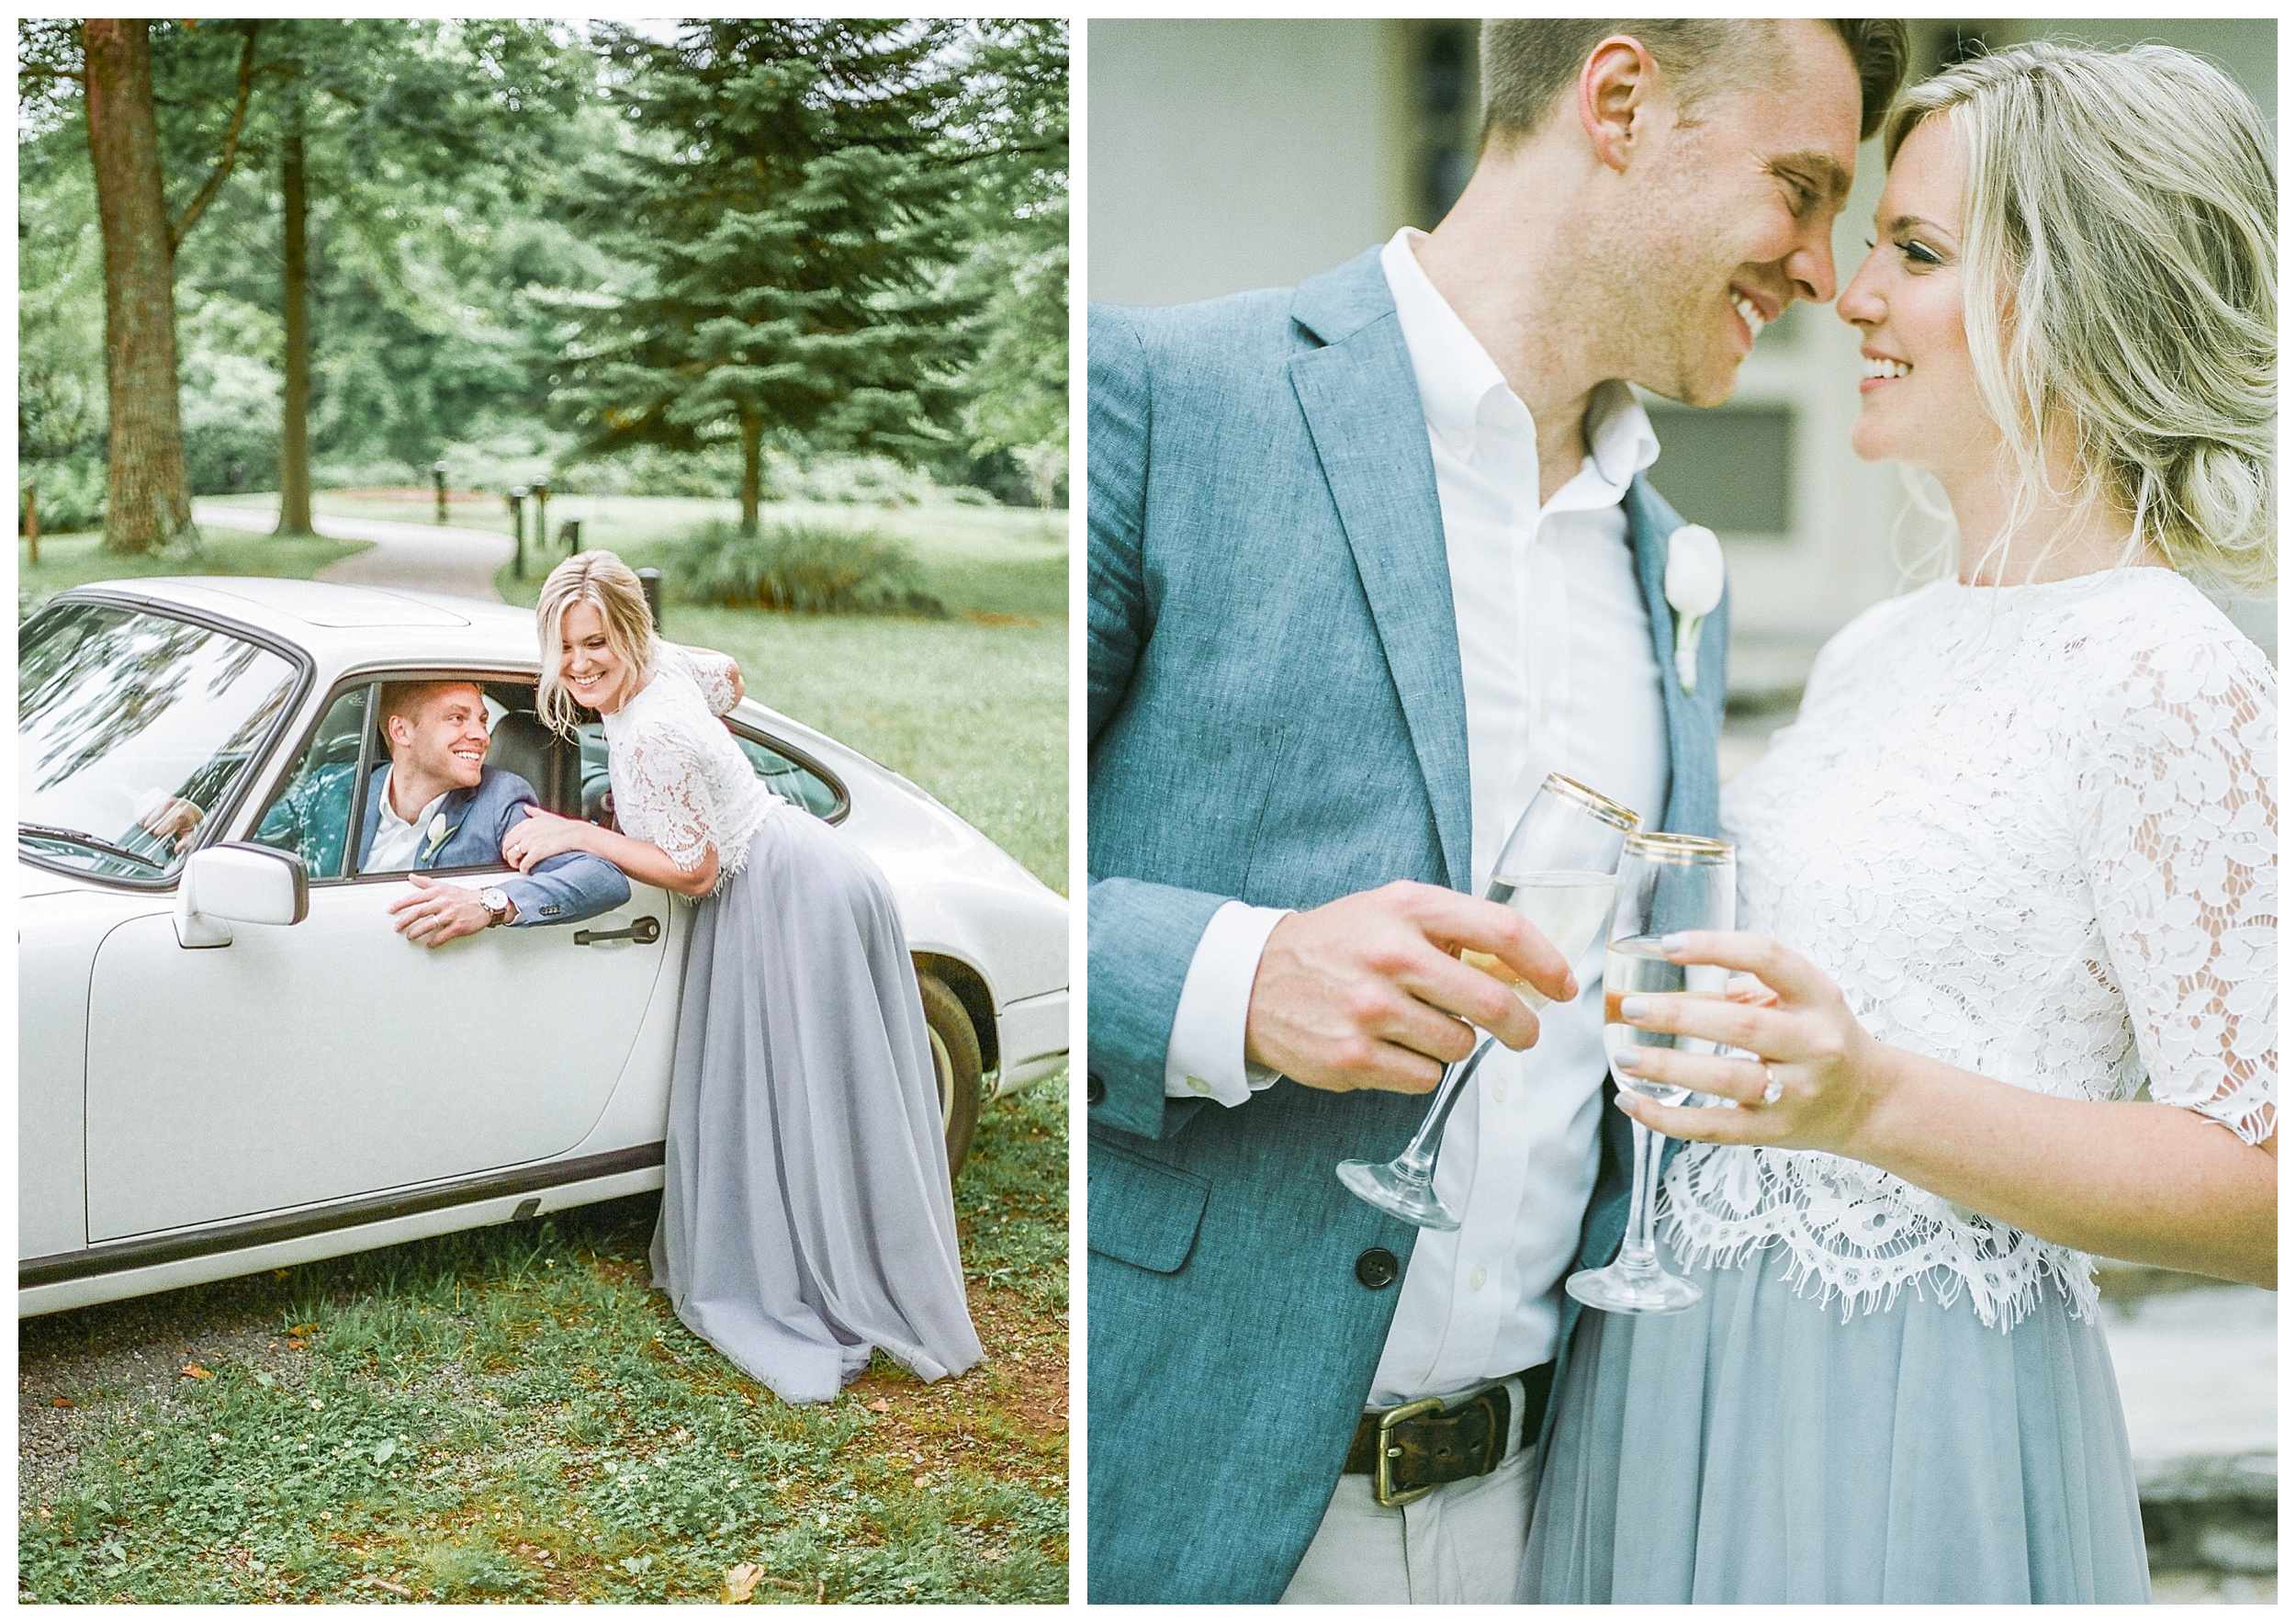 Rust Manor Wedding   Virginia Wedding Photographer Kir Tuben_0047.jpg